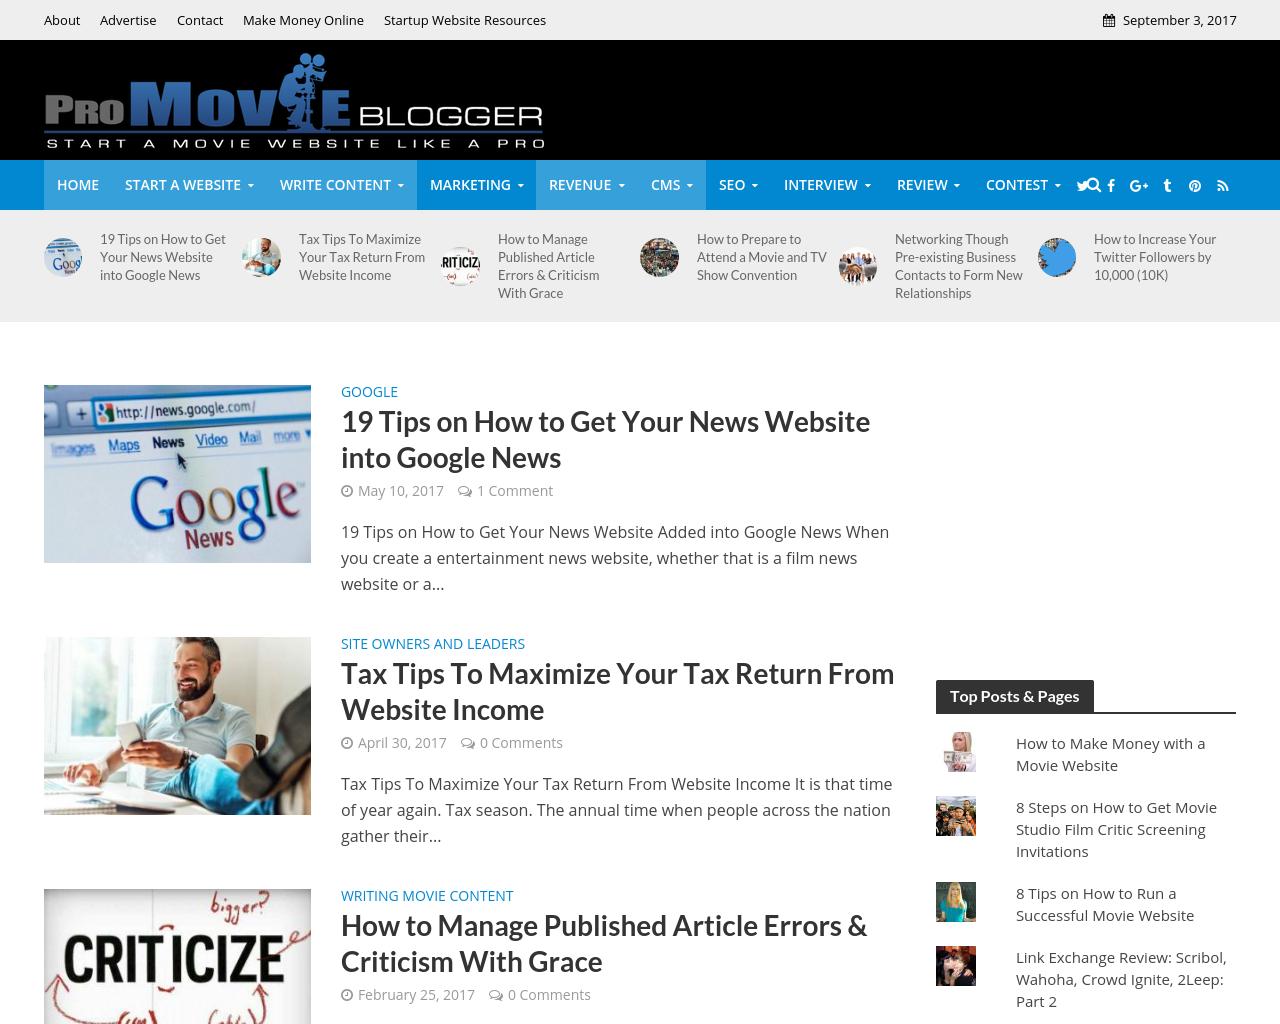 Promovieblogger-Advertising-Reviews-Pricing